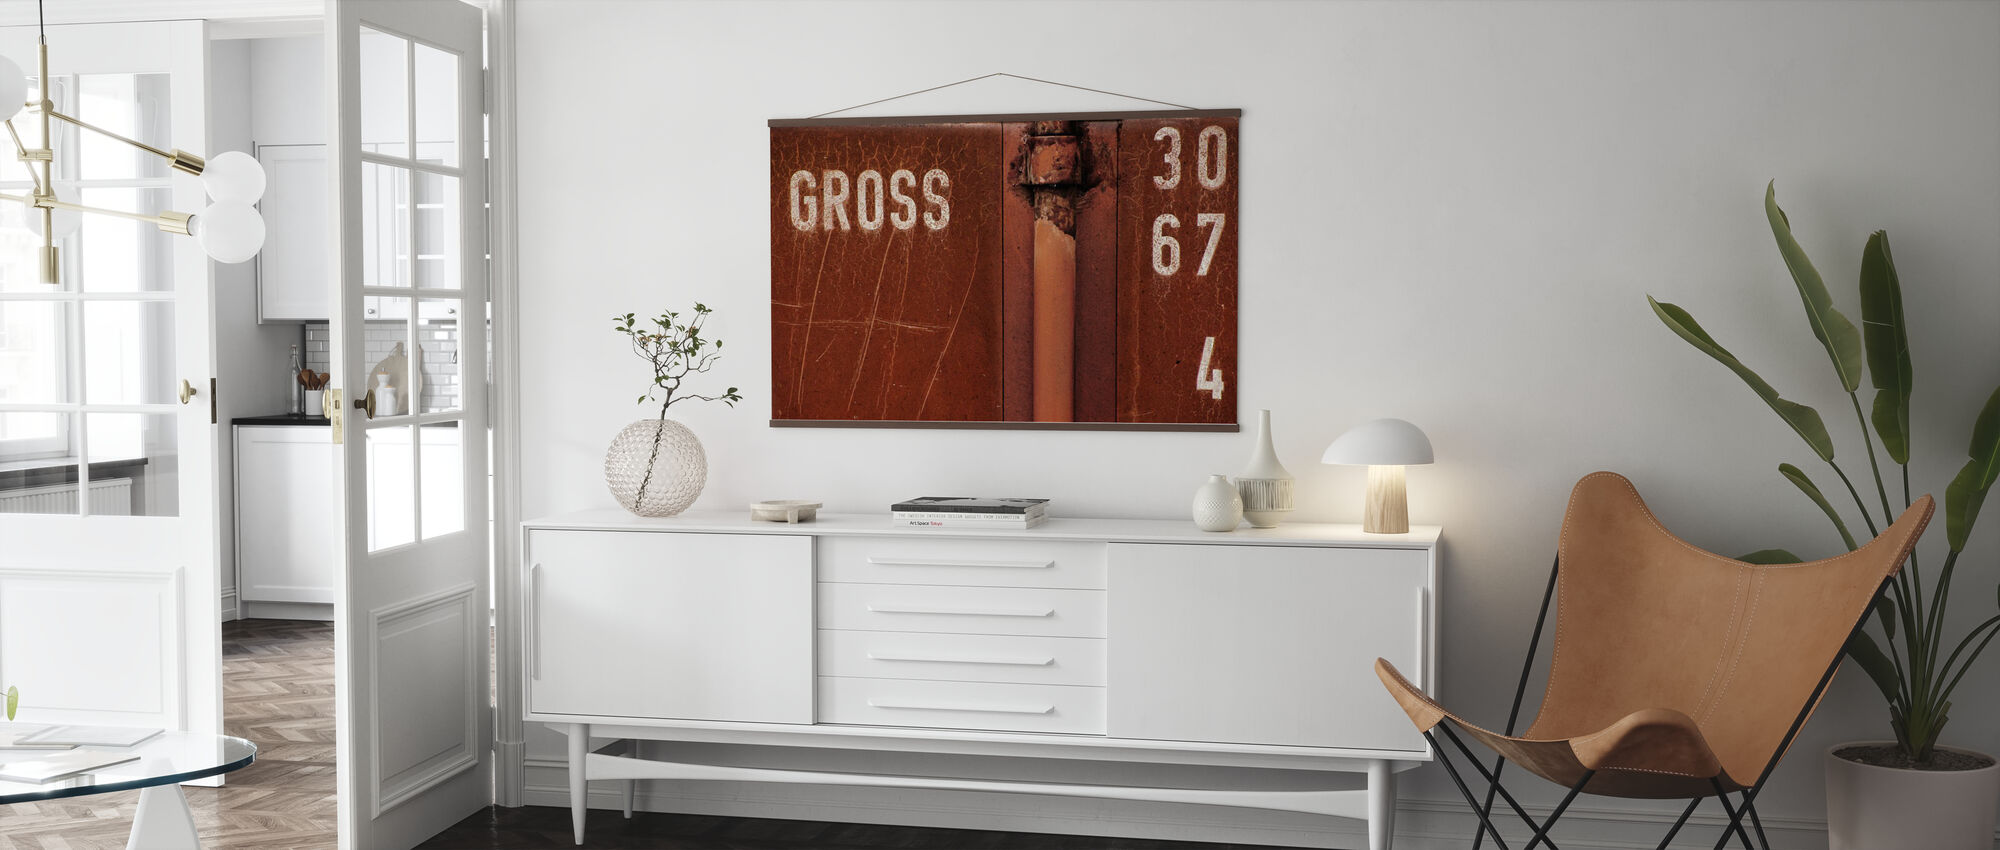 Gross Wall - Poster - Living Room